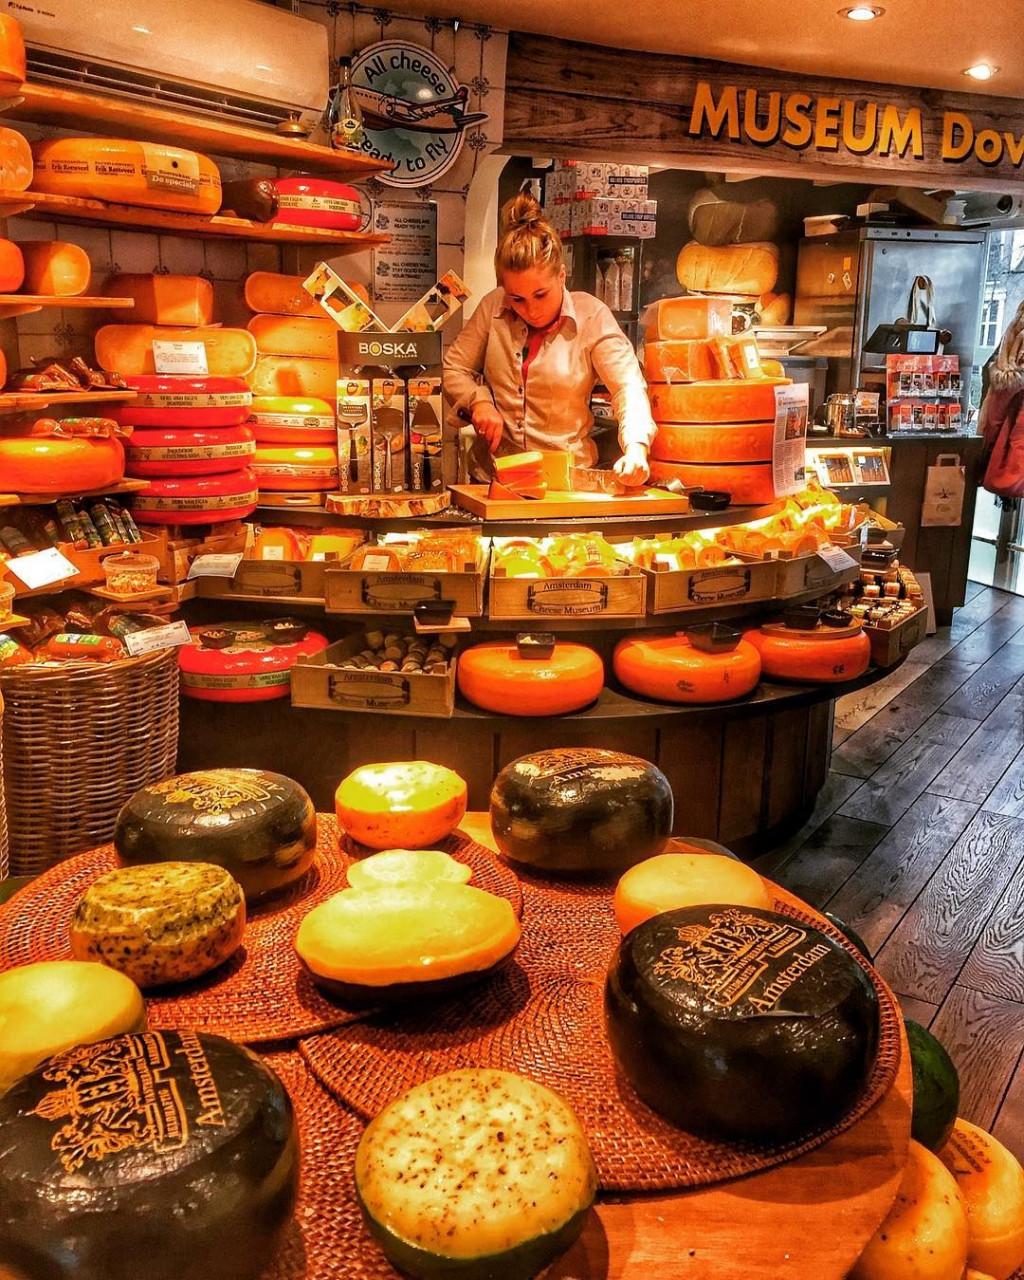 amsterdam cheese museum holland